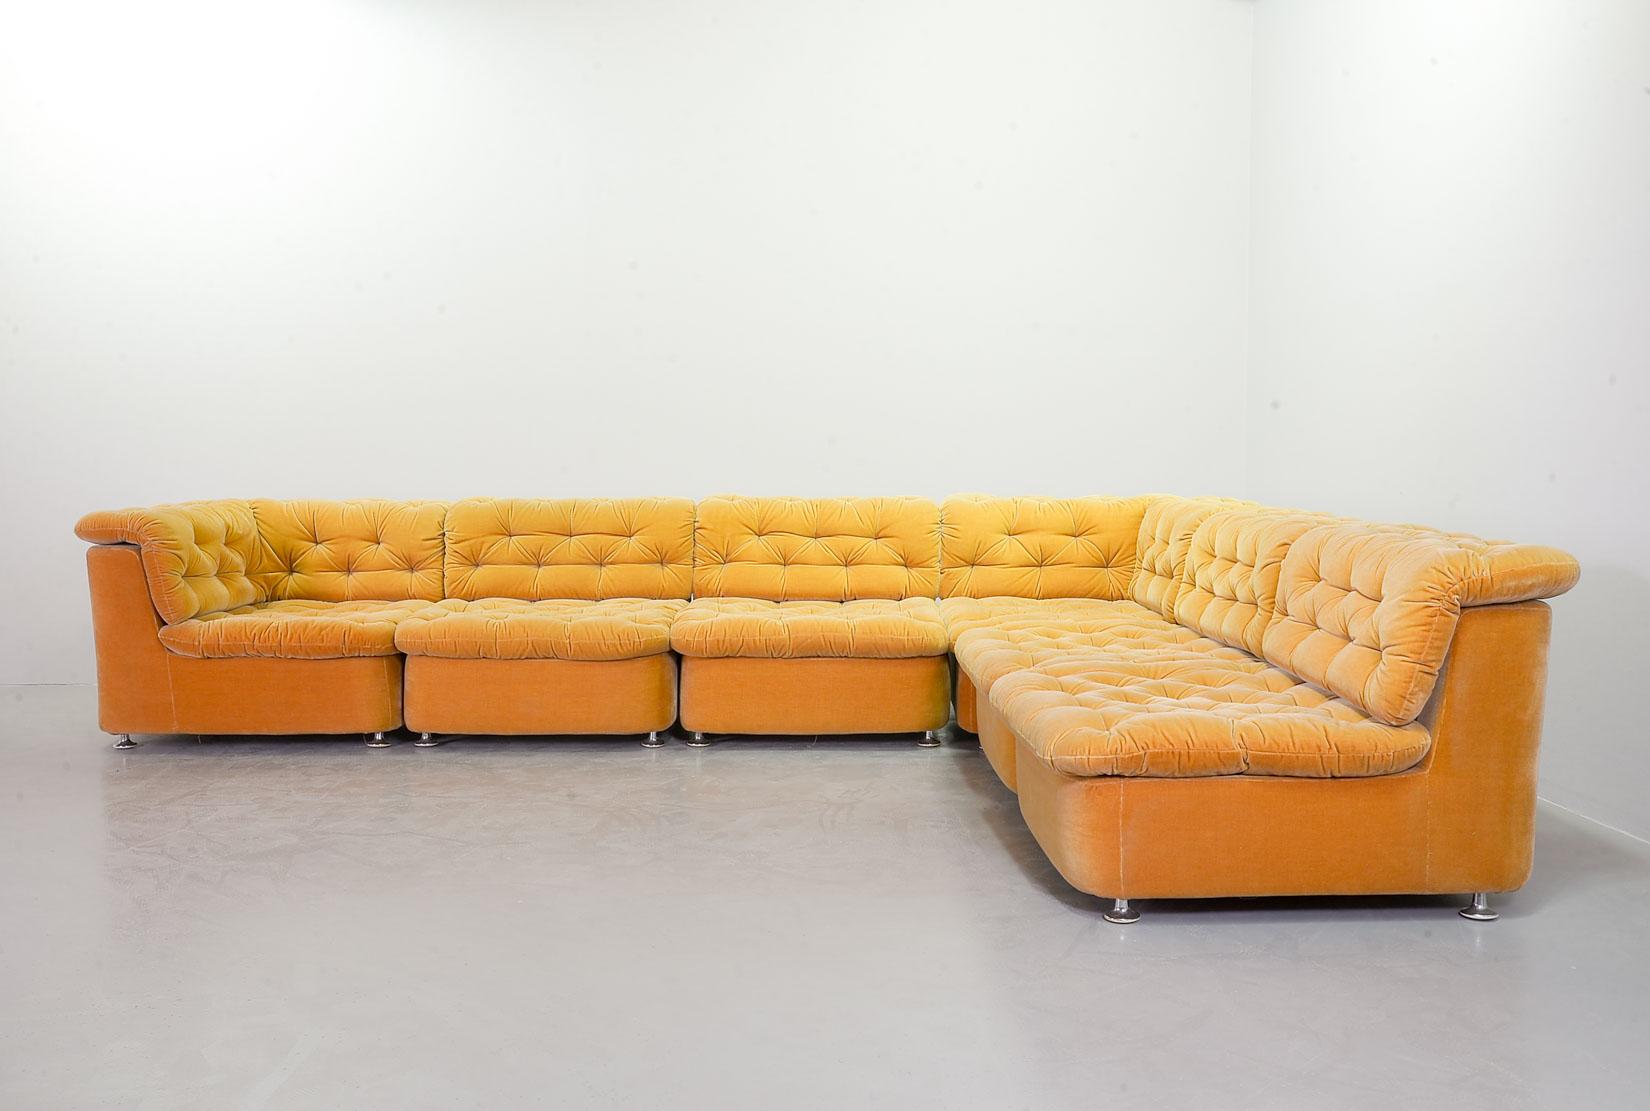 Dreipunkt Large Modular Lounge Sofa In Ochre Peach Velvet Fabric Germany 1970s Ref S055 Hpvintage Com